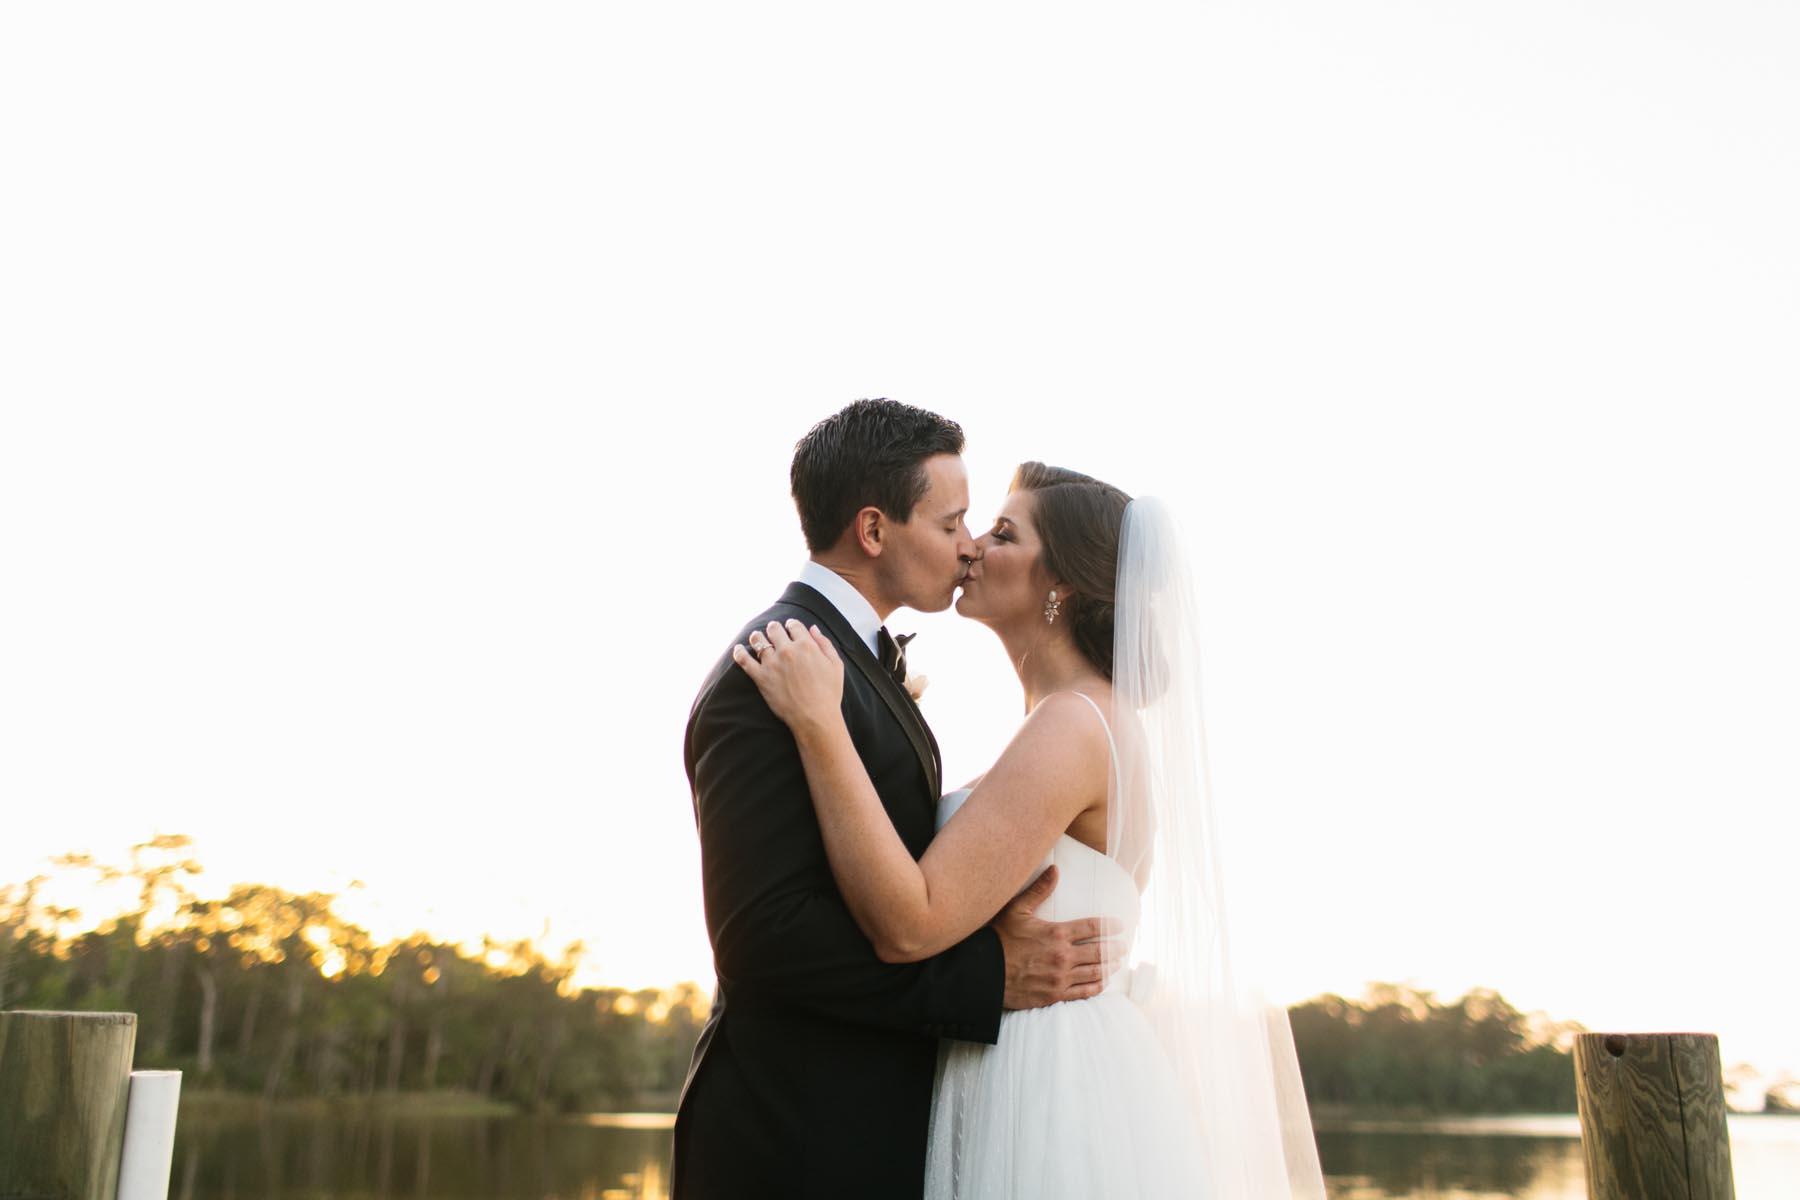 lowry wedding blog eden garden florida wedding-112